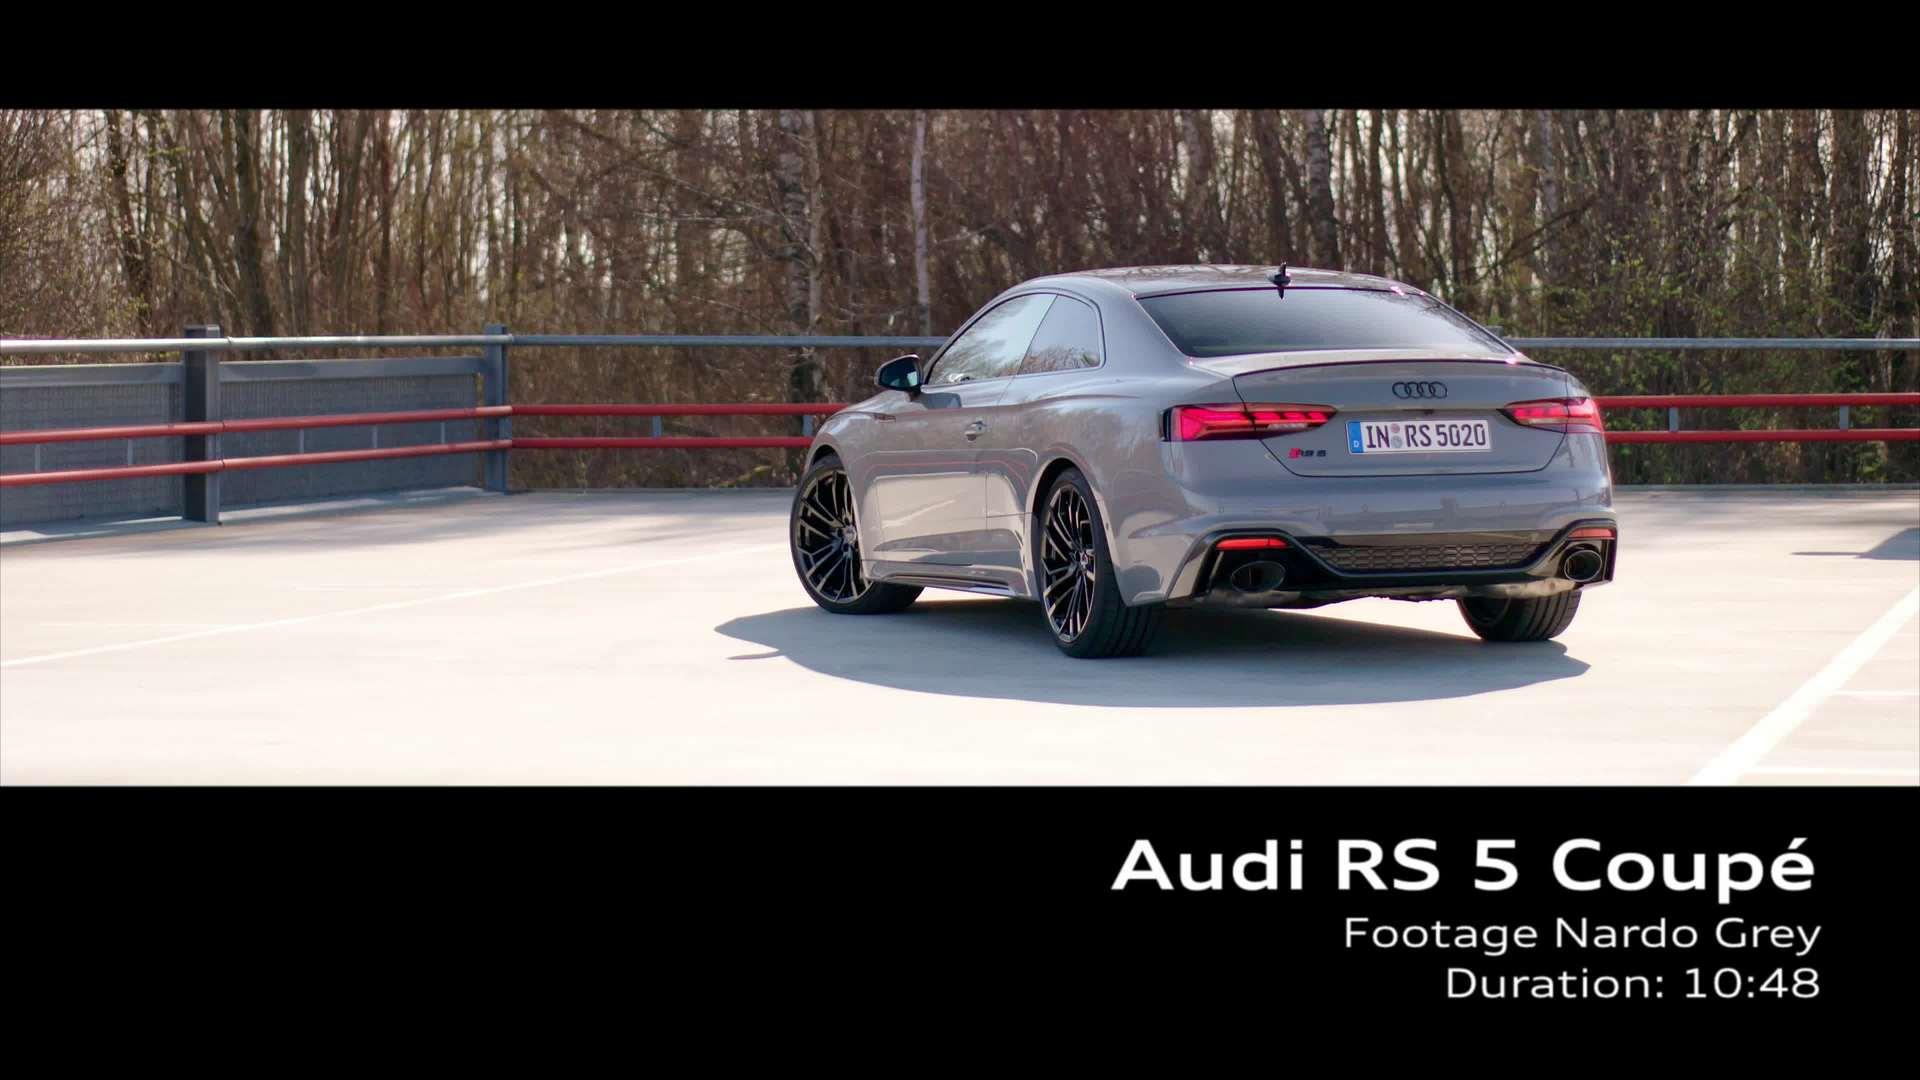 Footage: Audi RS 5 Coupé Nardograu